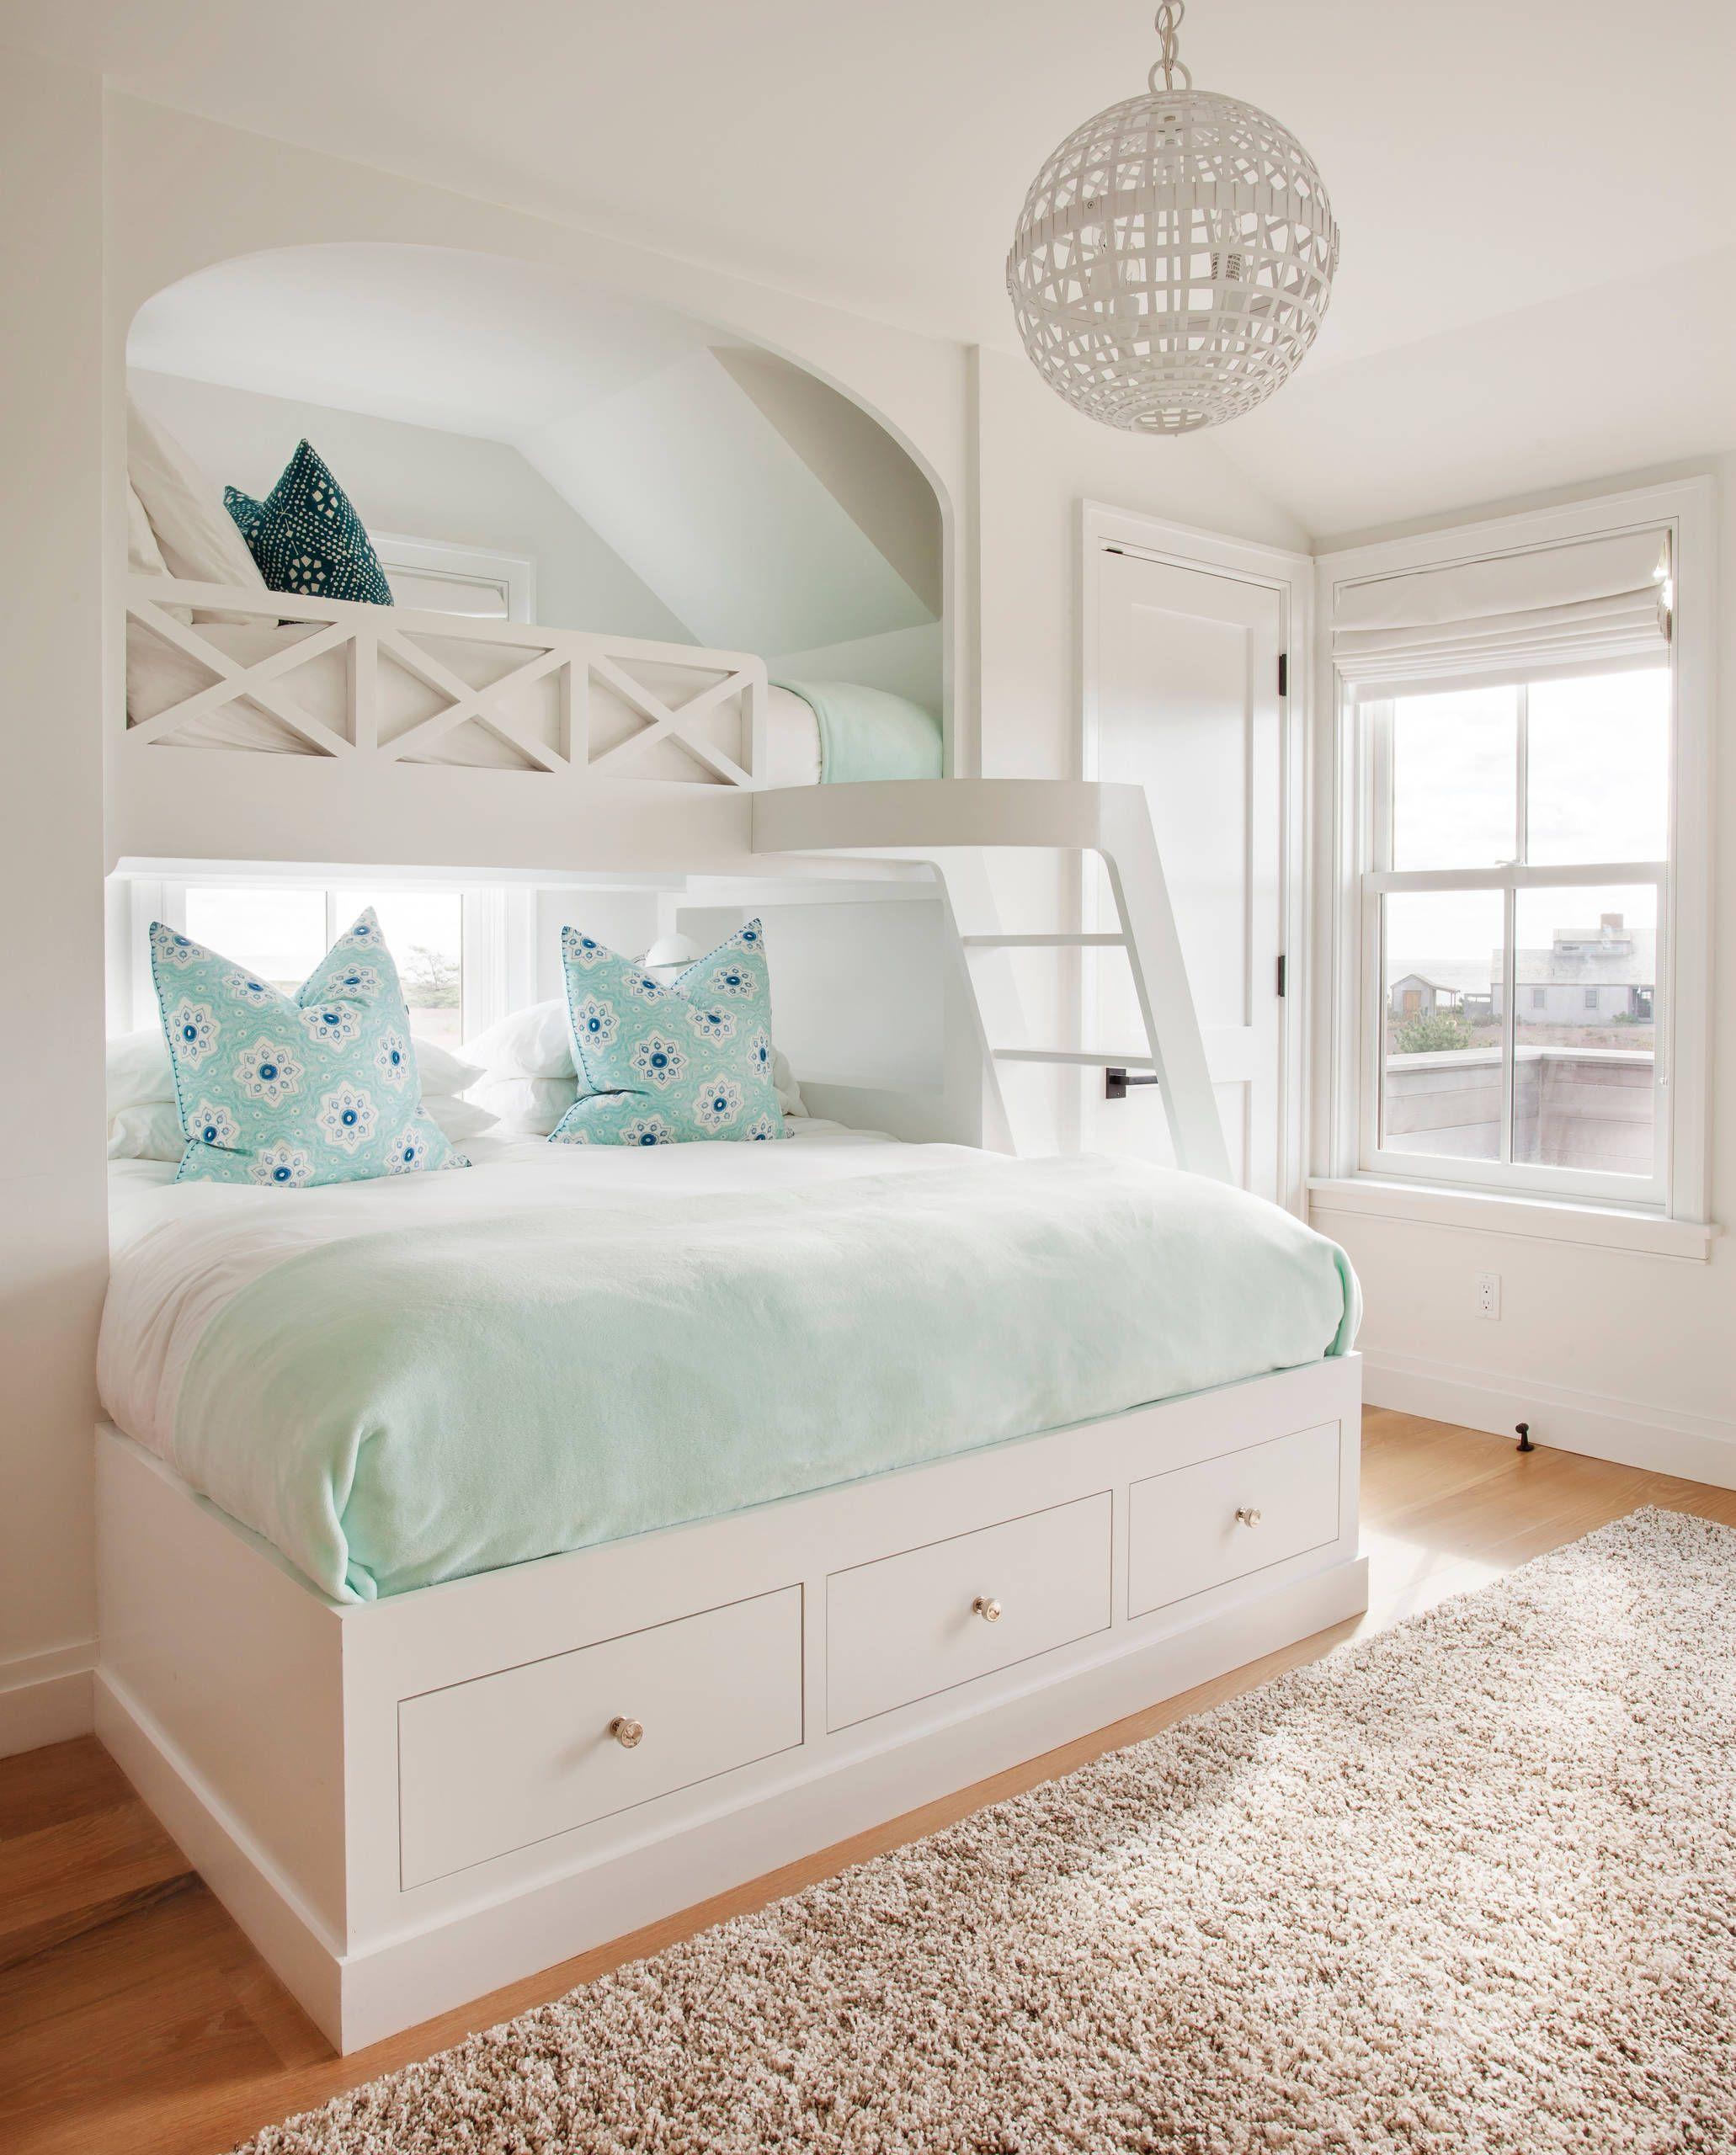 40 Guest Bedroom Ideas: 40 Kid Rooms That Rock